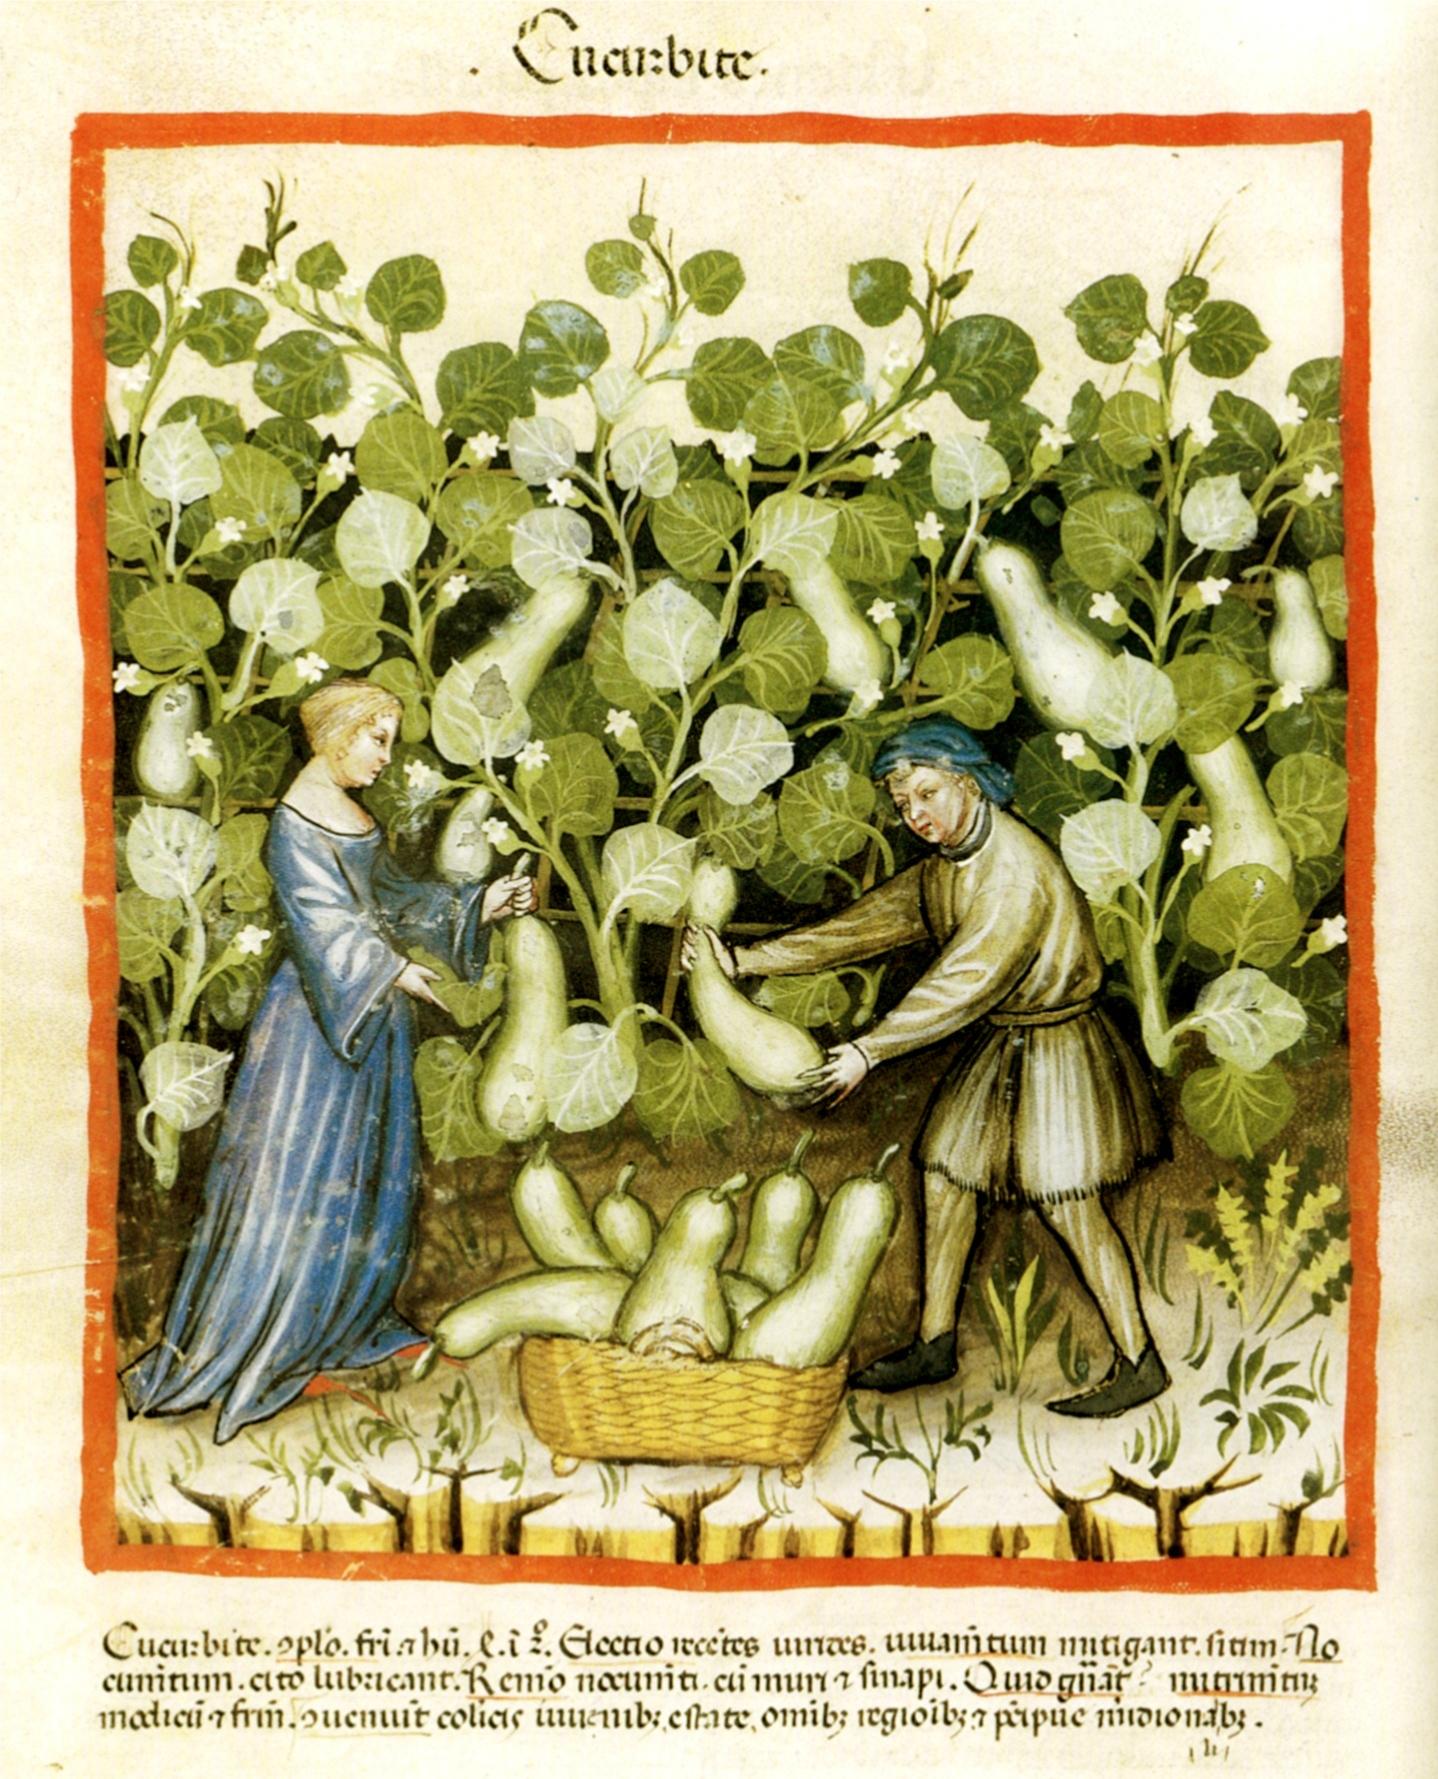 © BNF - département des manuscrits, Latin 9333, fol.19v.